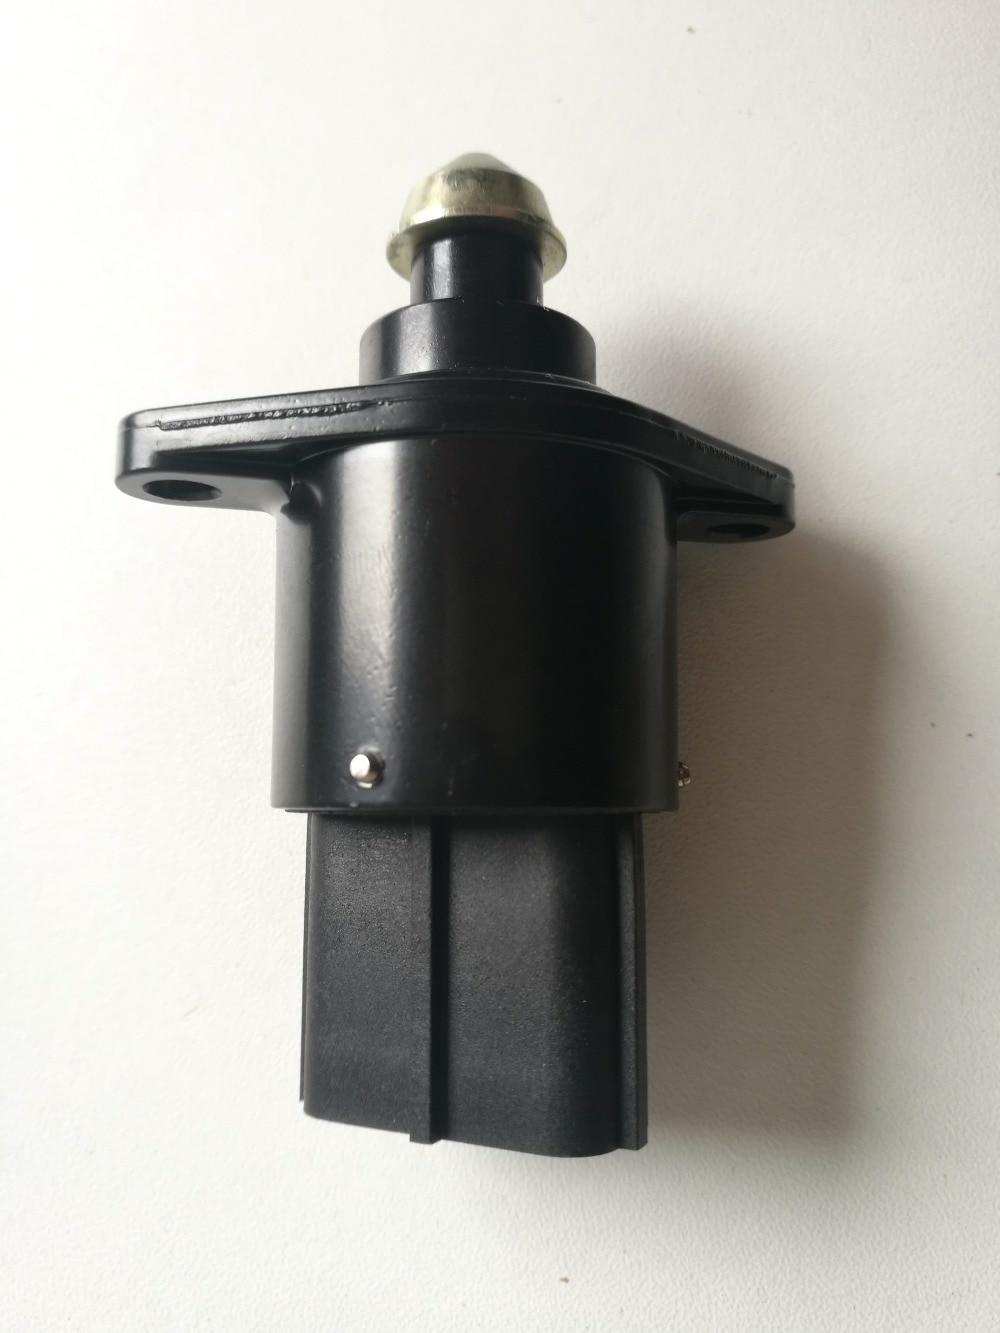 Válvula de control de aire en reposo IAC para Dodge Jeep Grand Cherokee 53030840 AC543 SE95155 150-325, 50657 de 53030751 2H1095 AC328